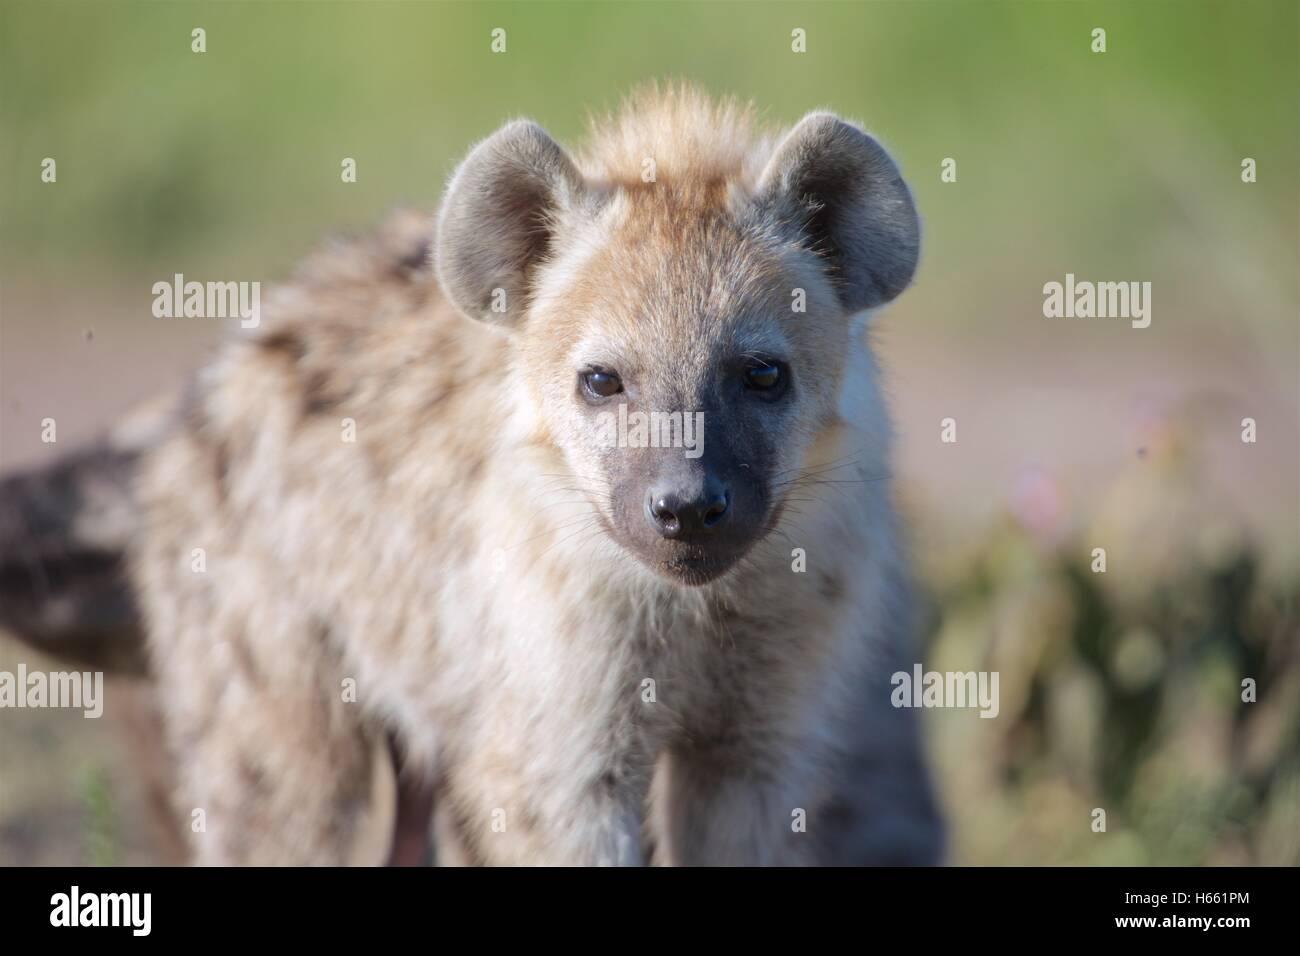 Young hyena on safari in Masai Mara, Kenya. - Stock Image